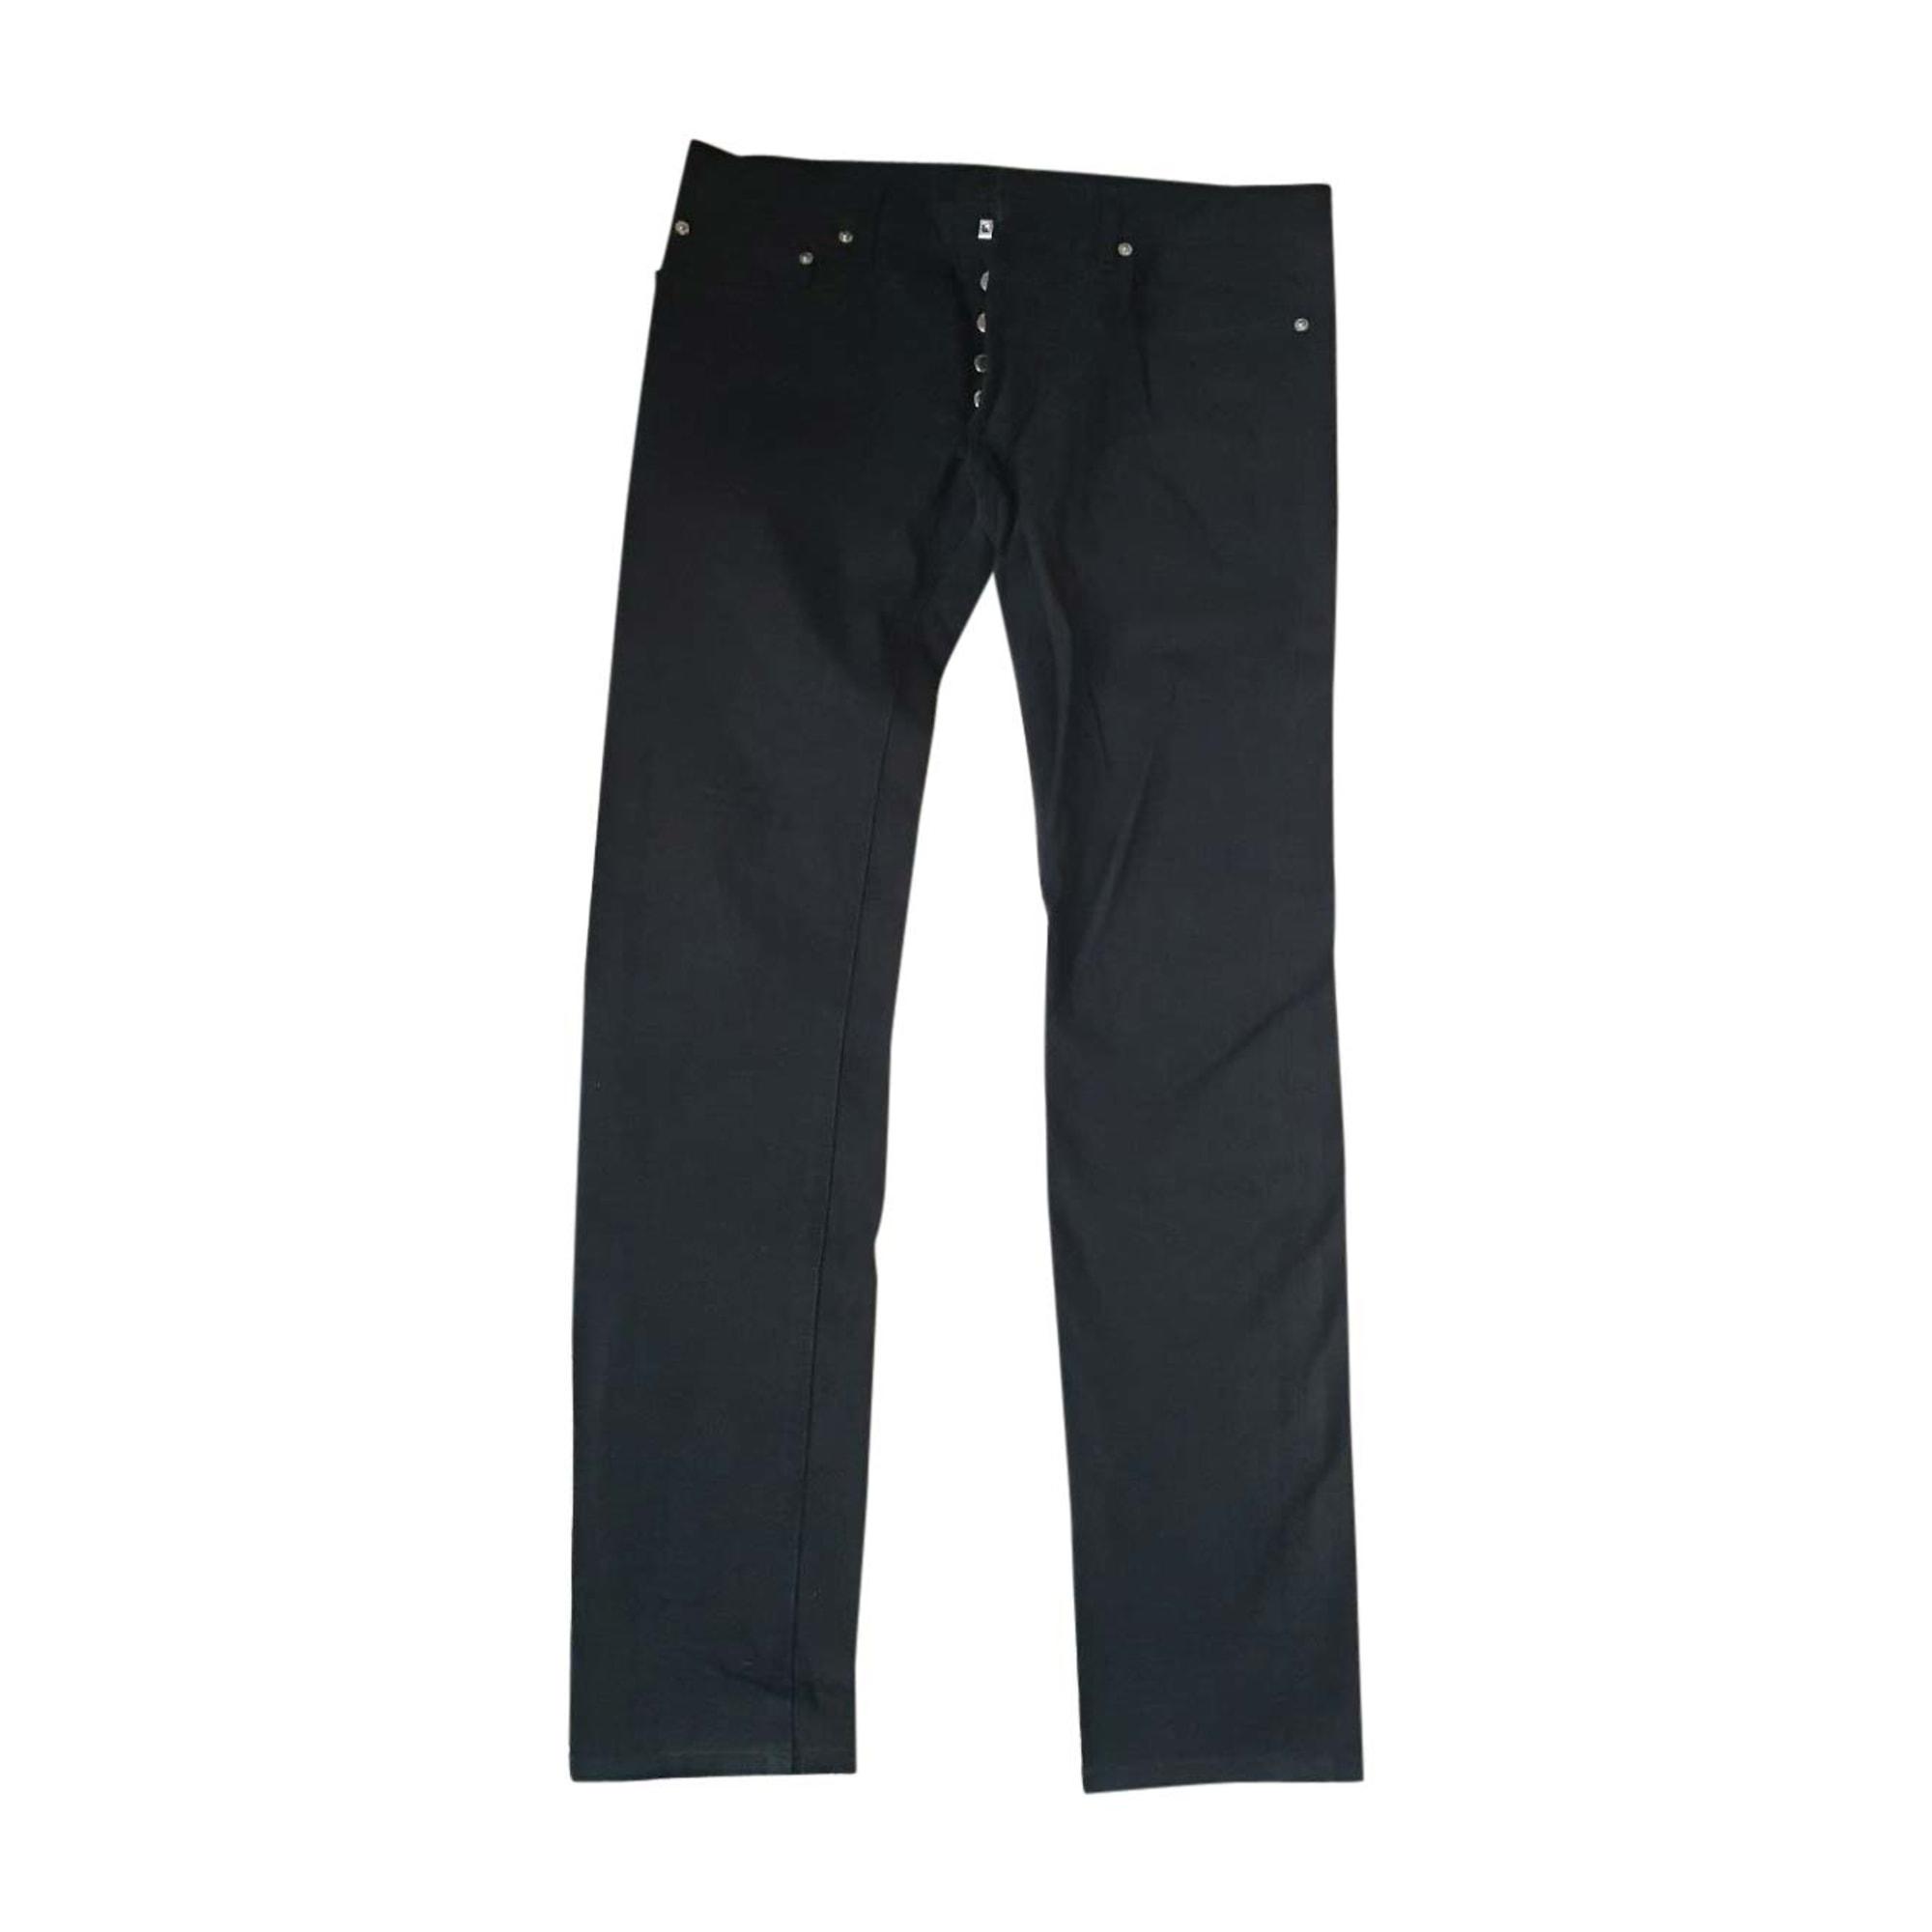 Skinny Jeans DIOR HOMME Black